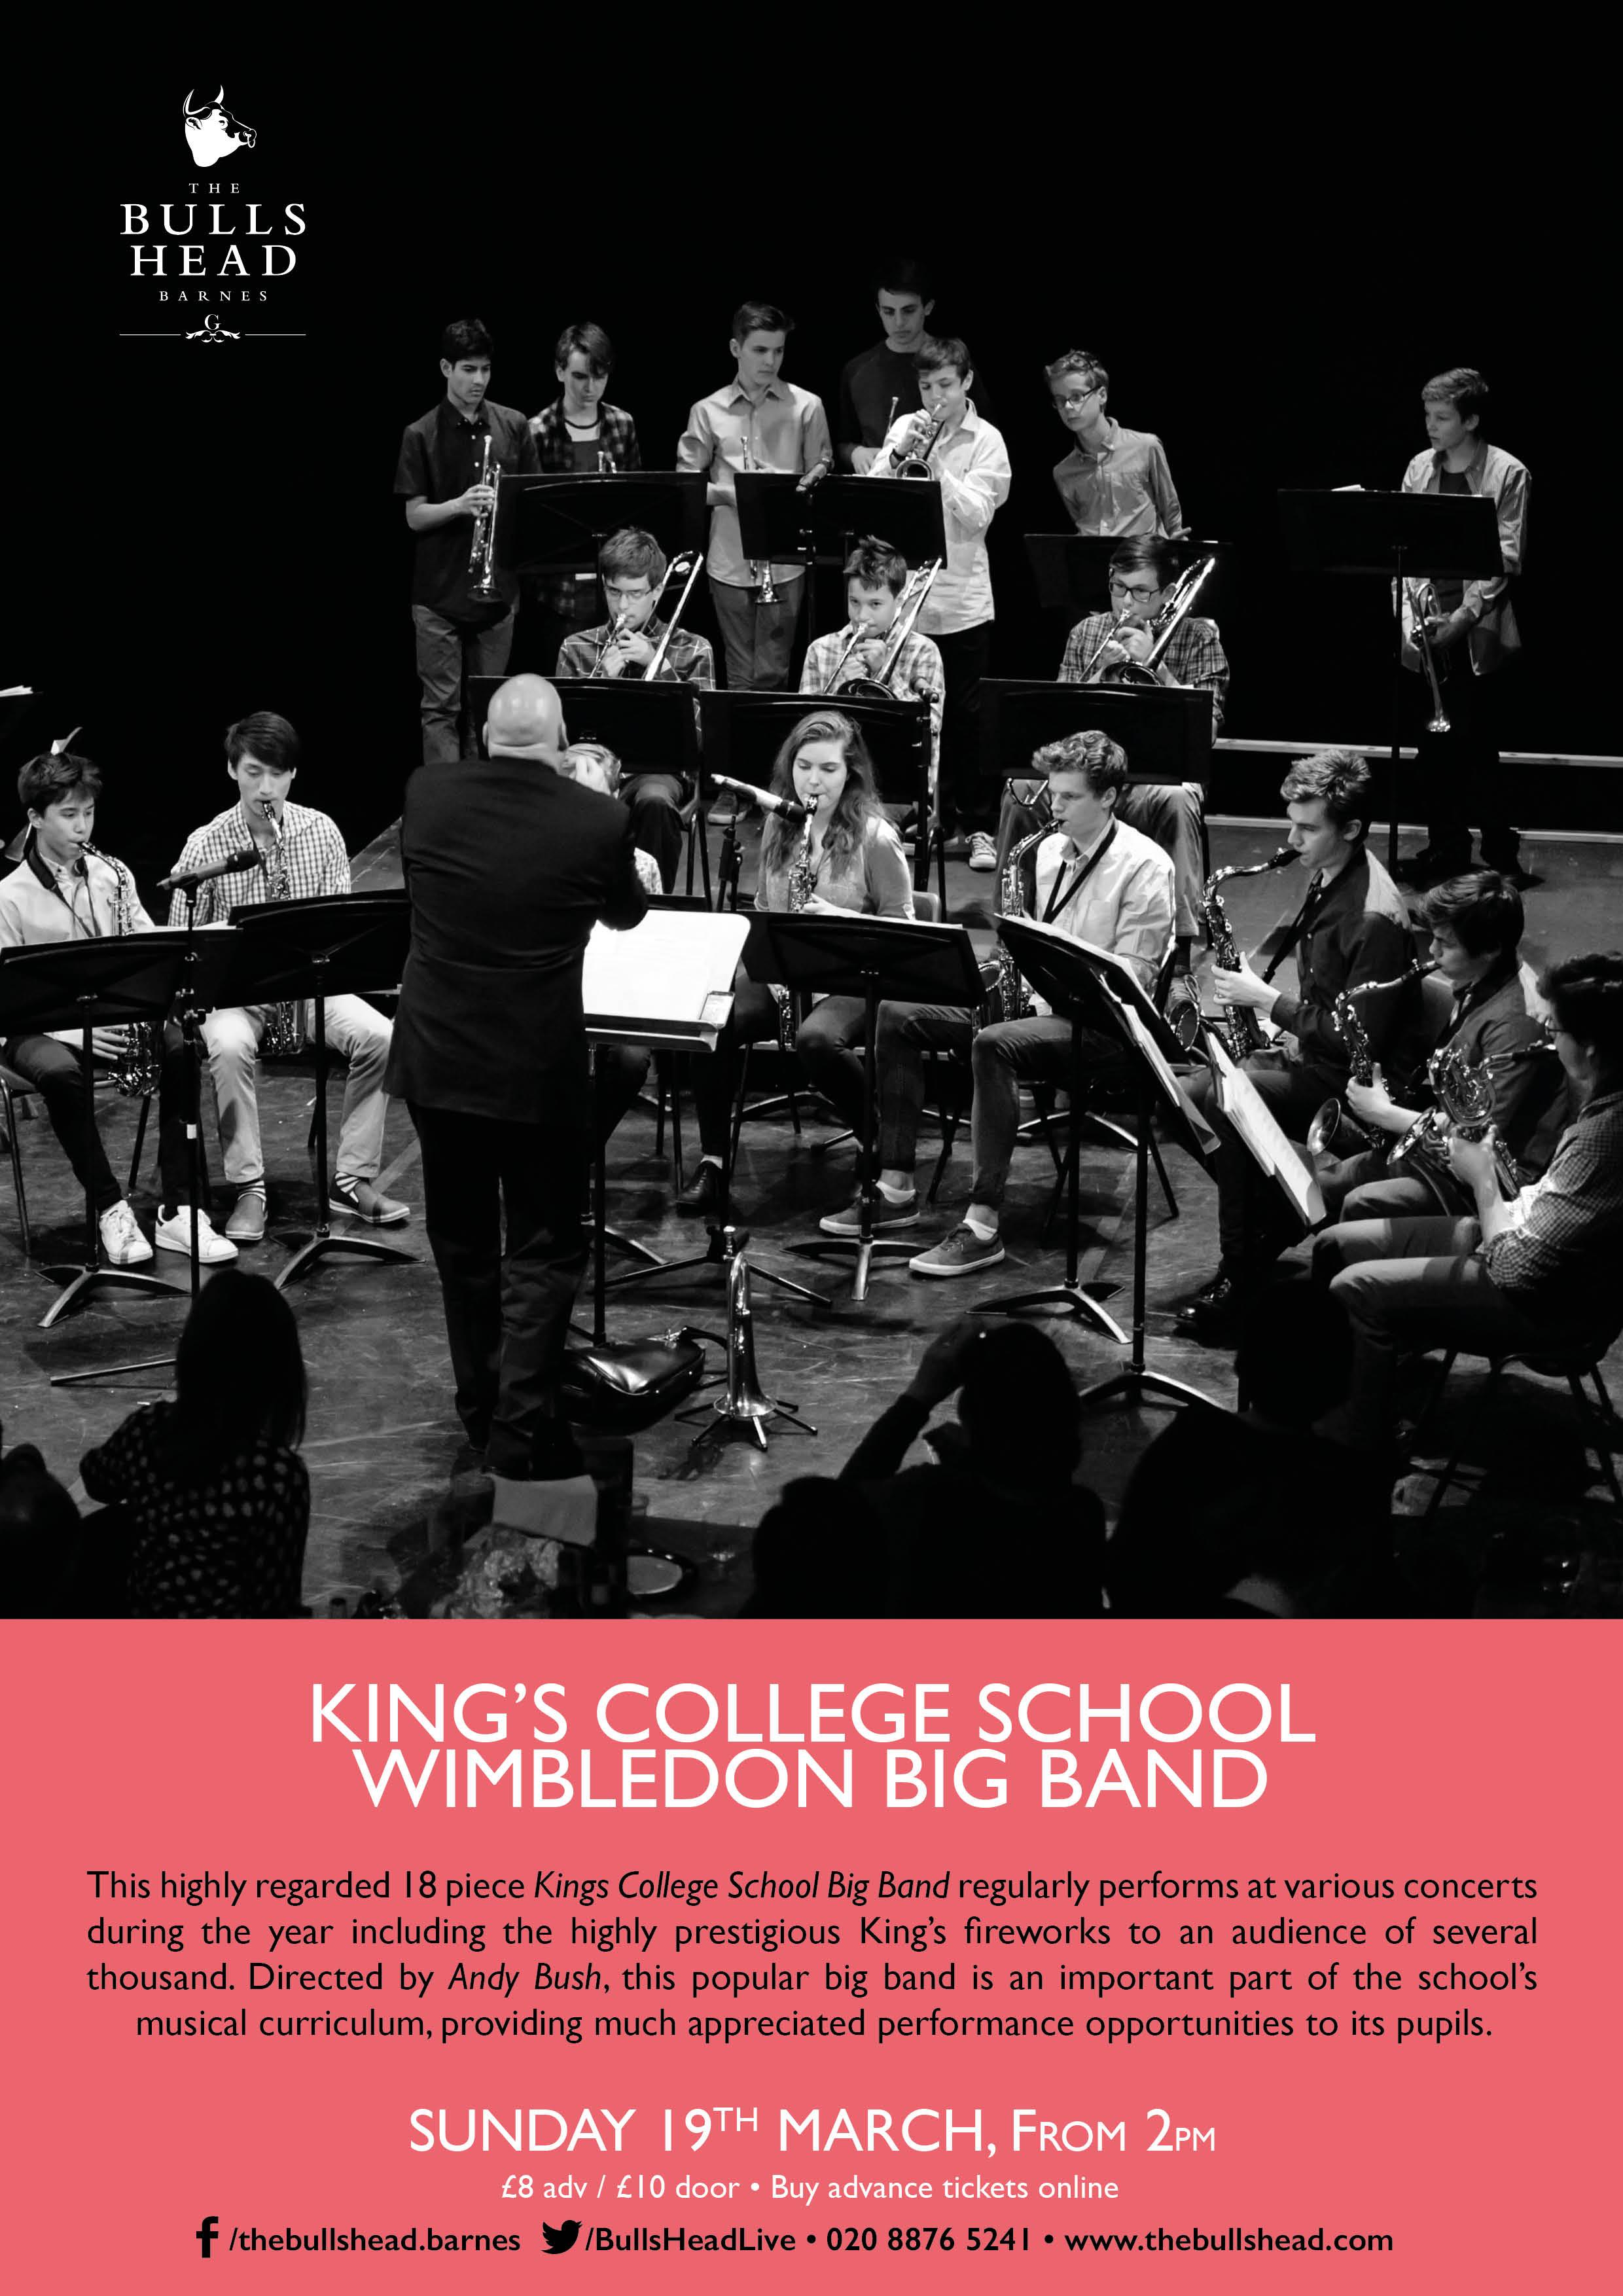 Kings College School Wimbledon Big Band